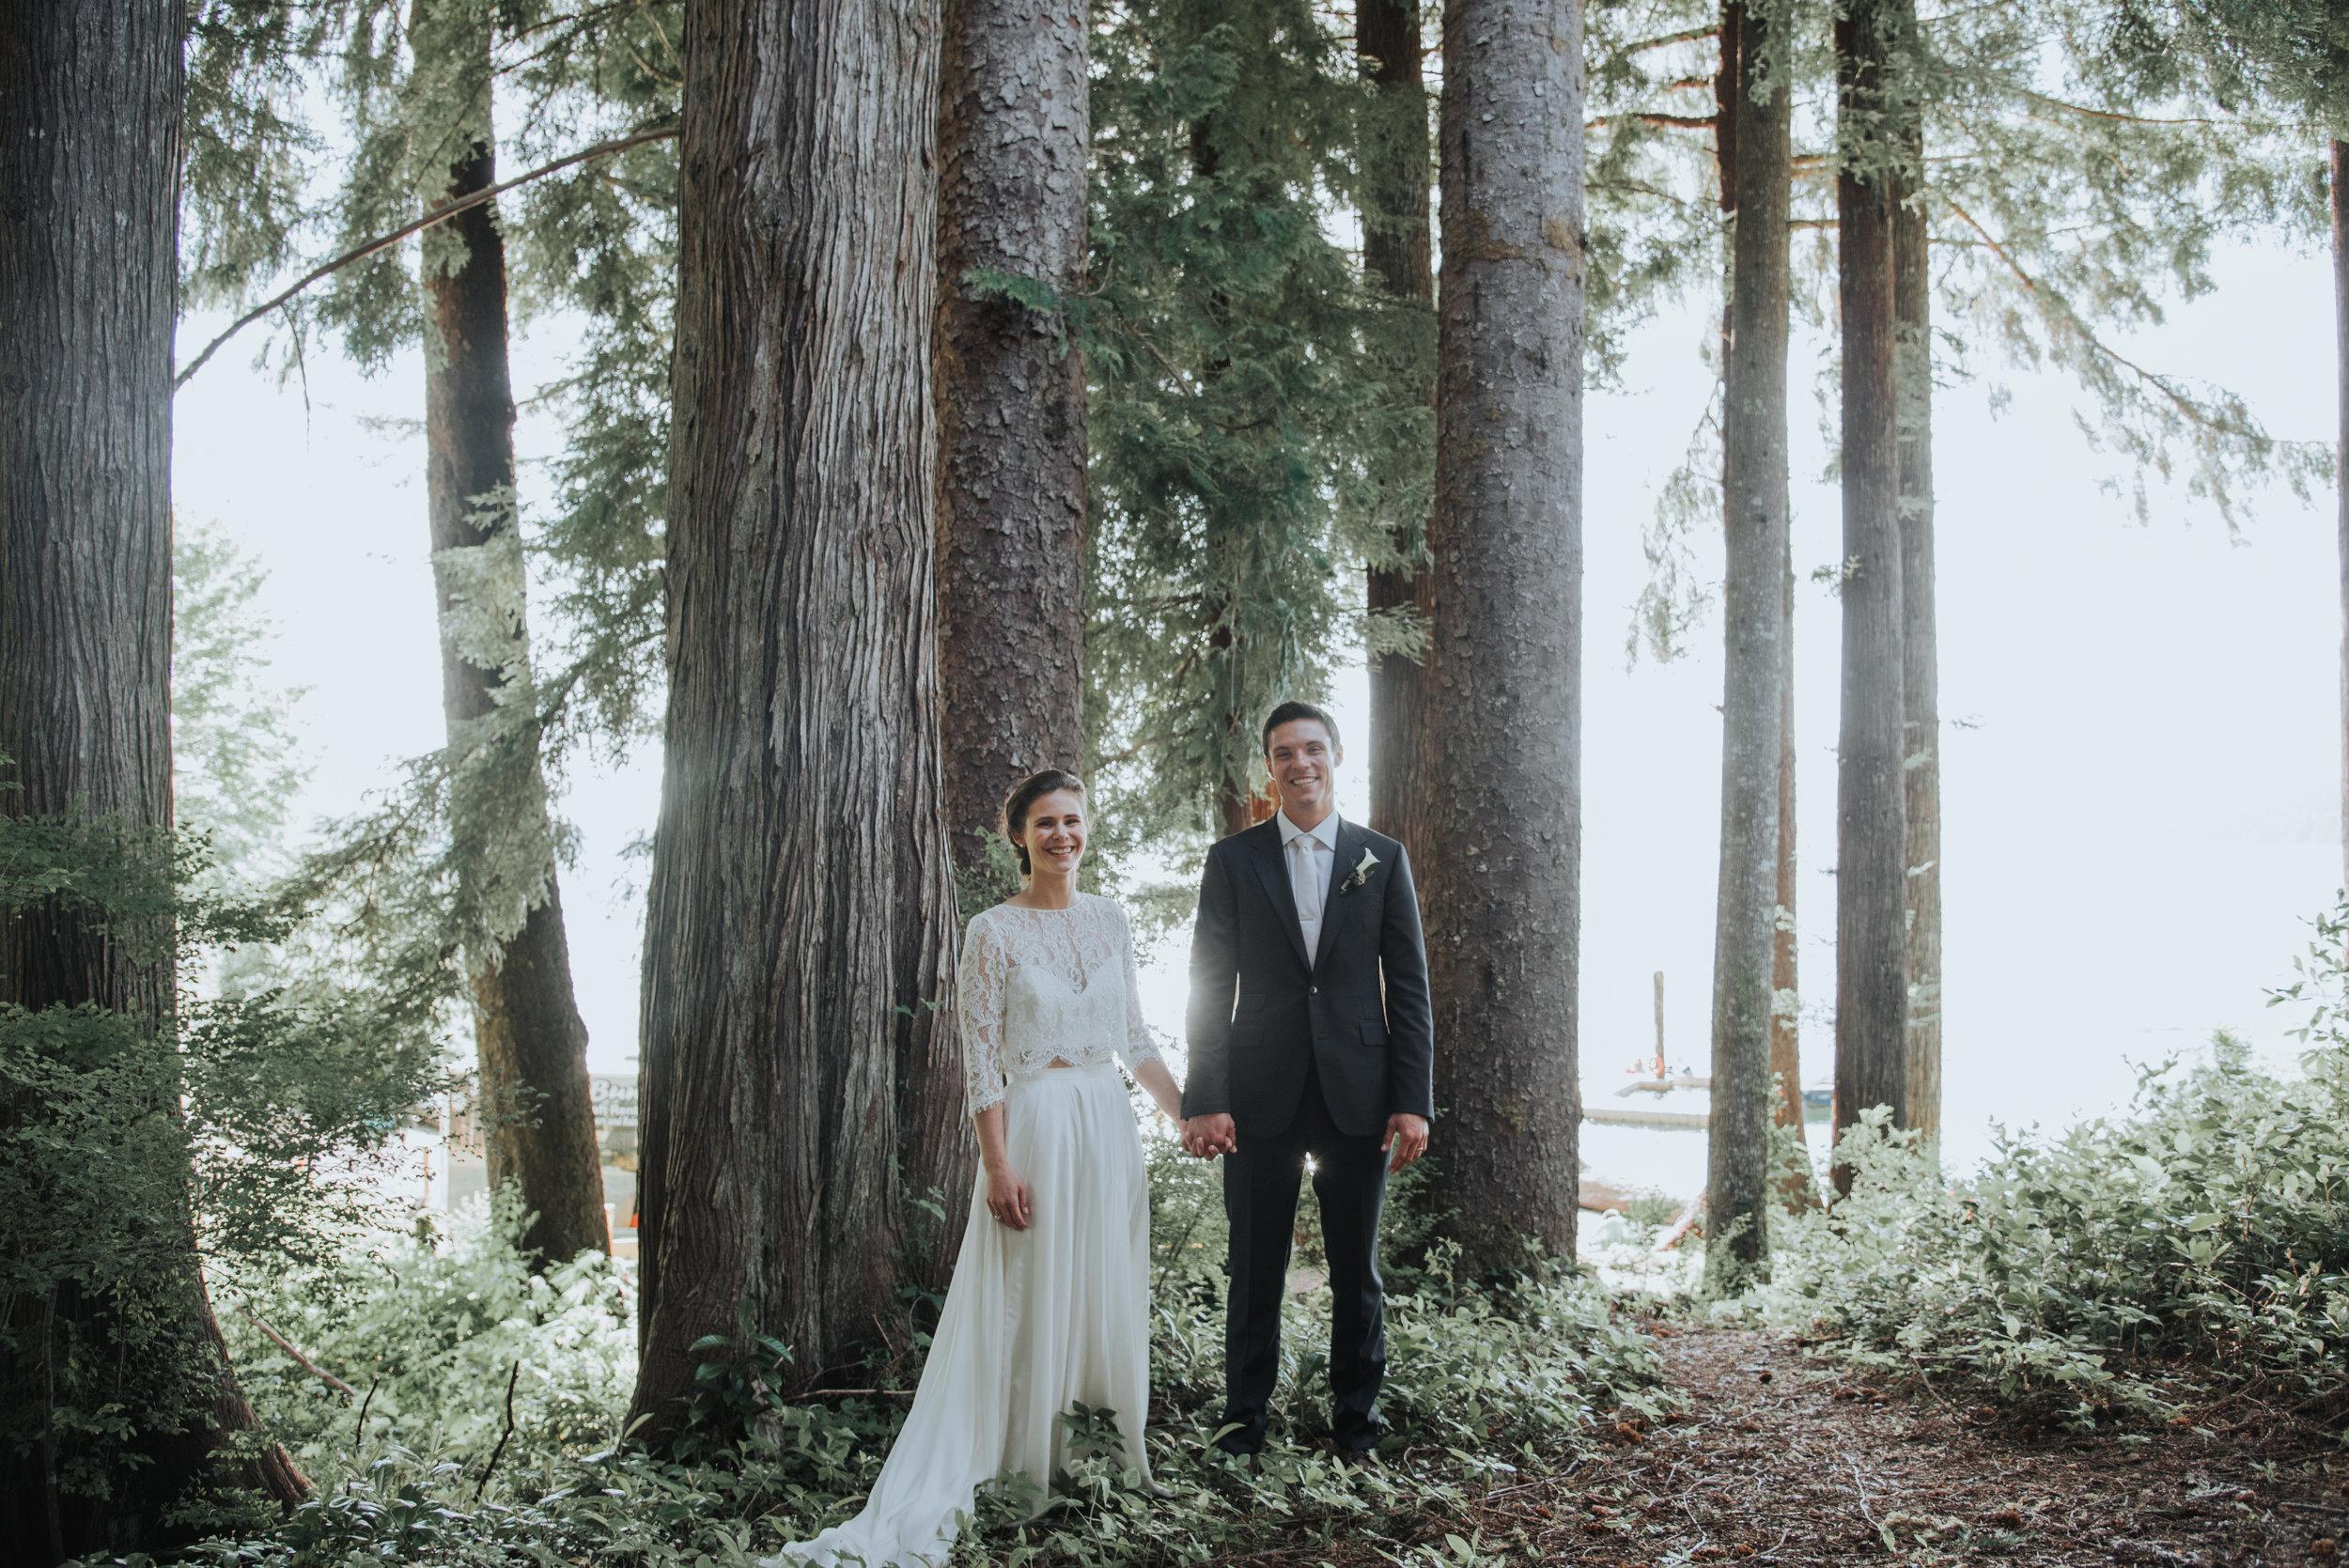 Elizabeth & Conor - Quinault, WAVenue: Lake Quinault LodgePhotographer: Logan Smith